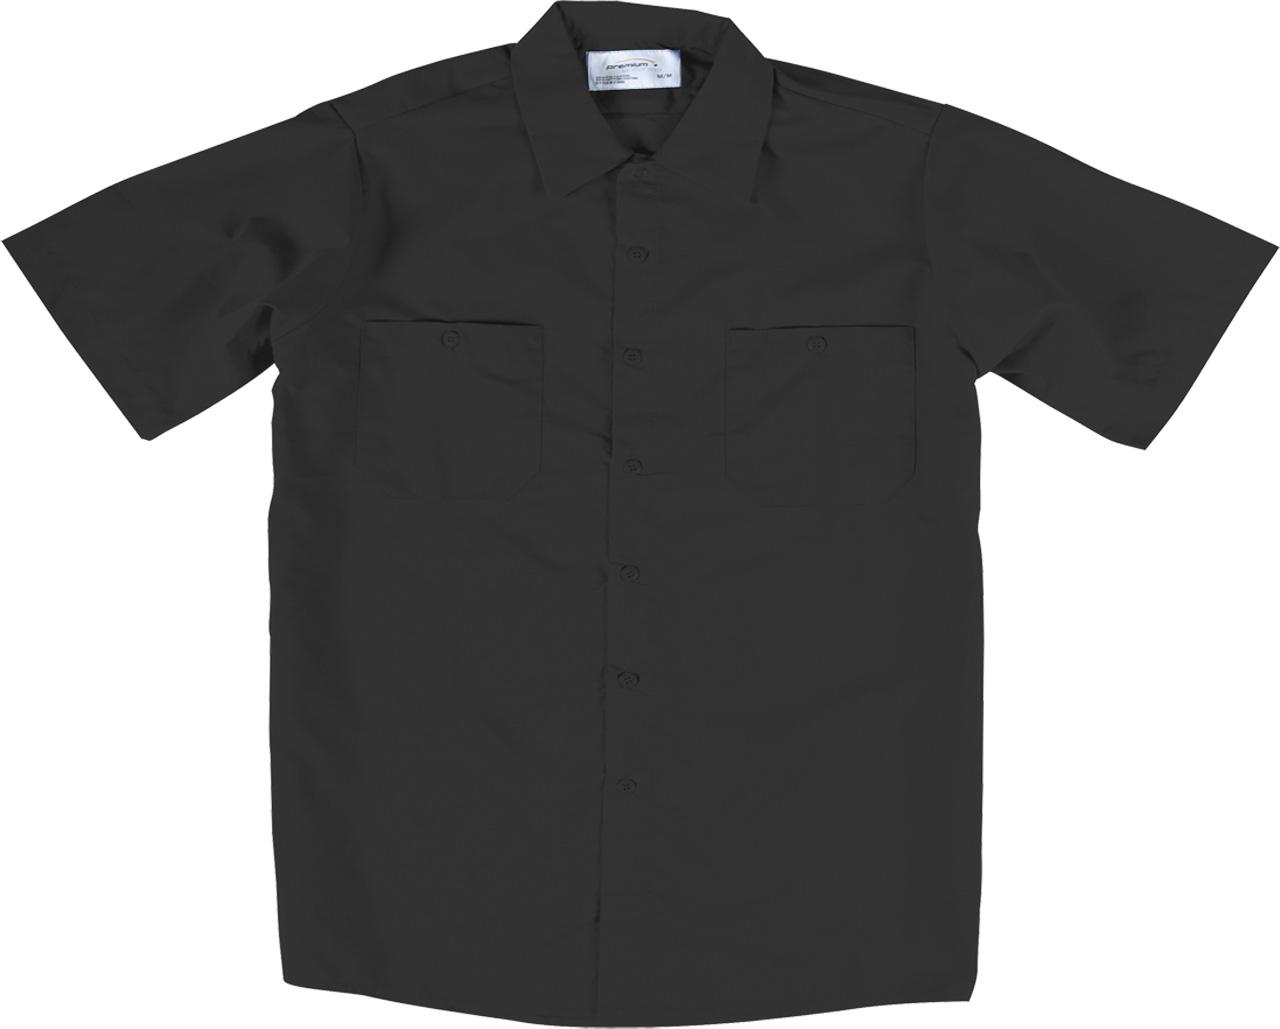 Picture of Premium Uniforms Short Sleeve Poly/Cotton Work Shirt